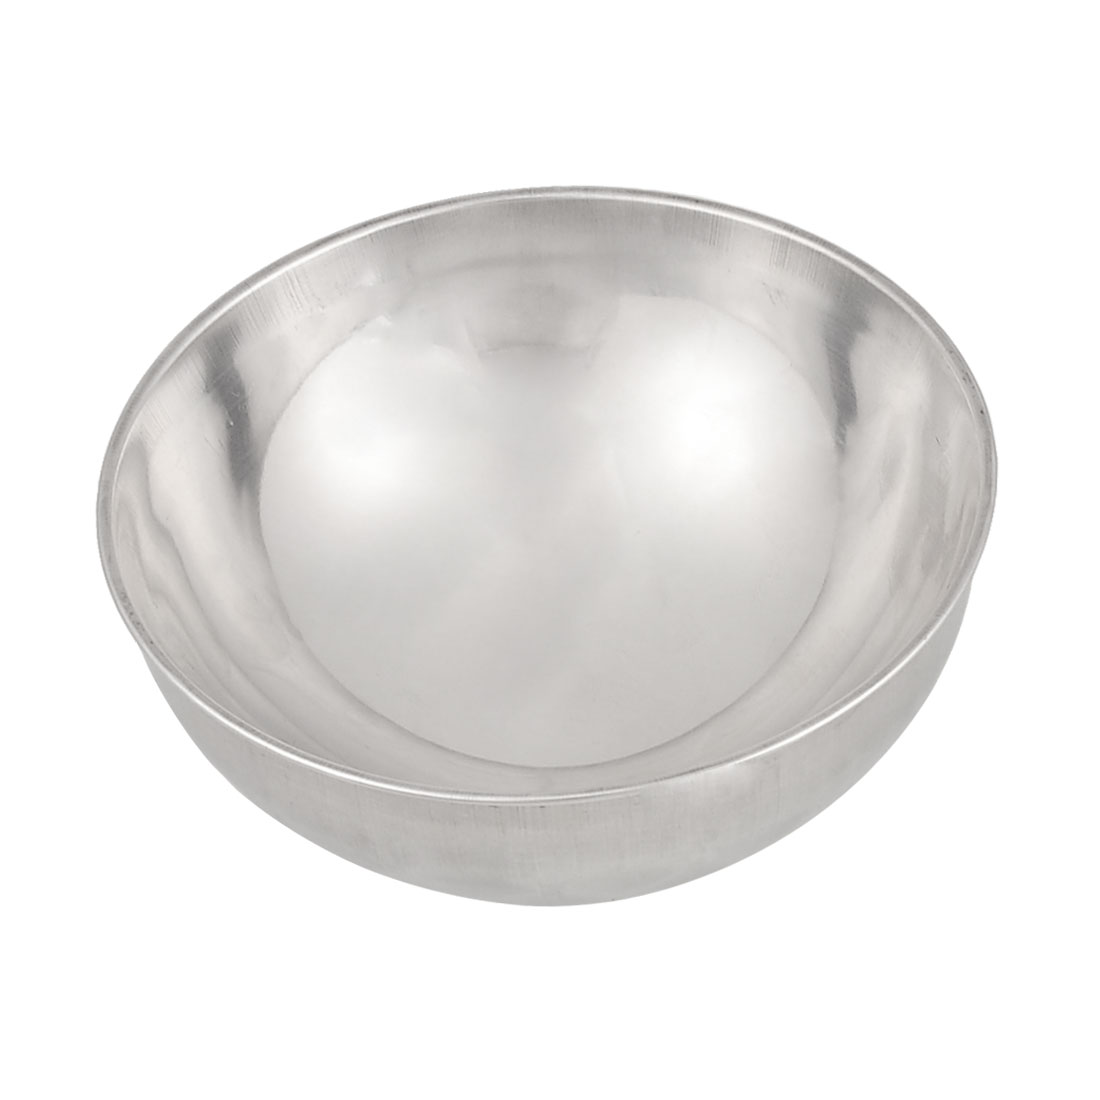 "Home Kitchen 4.3"" Diameter Stainless Steel Dinner Rice Bowl"